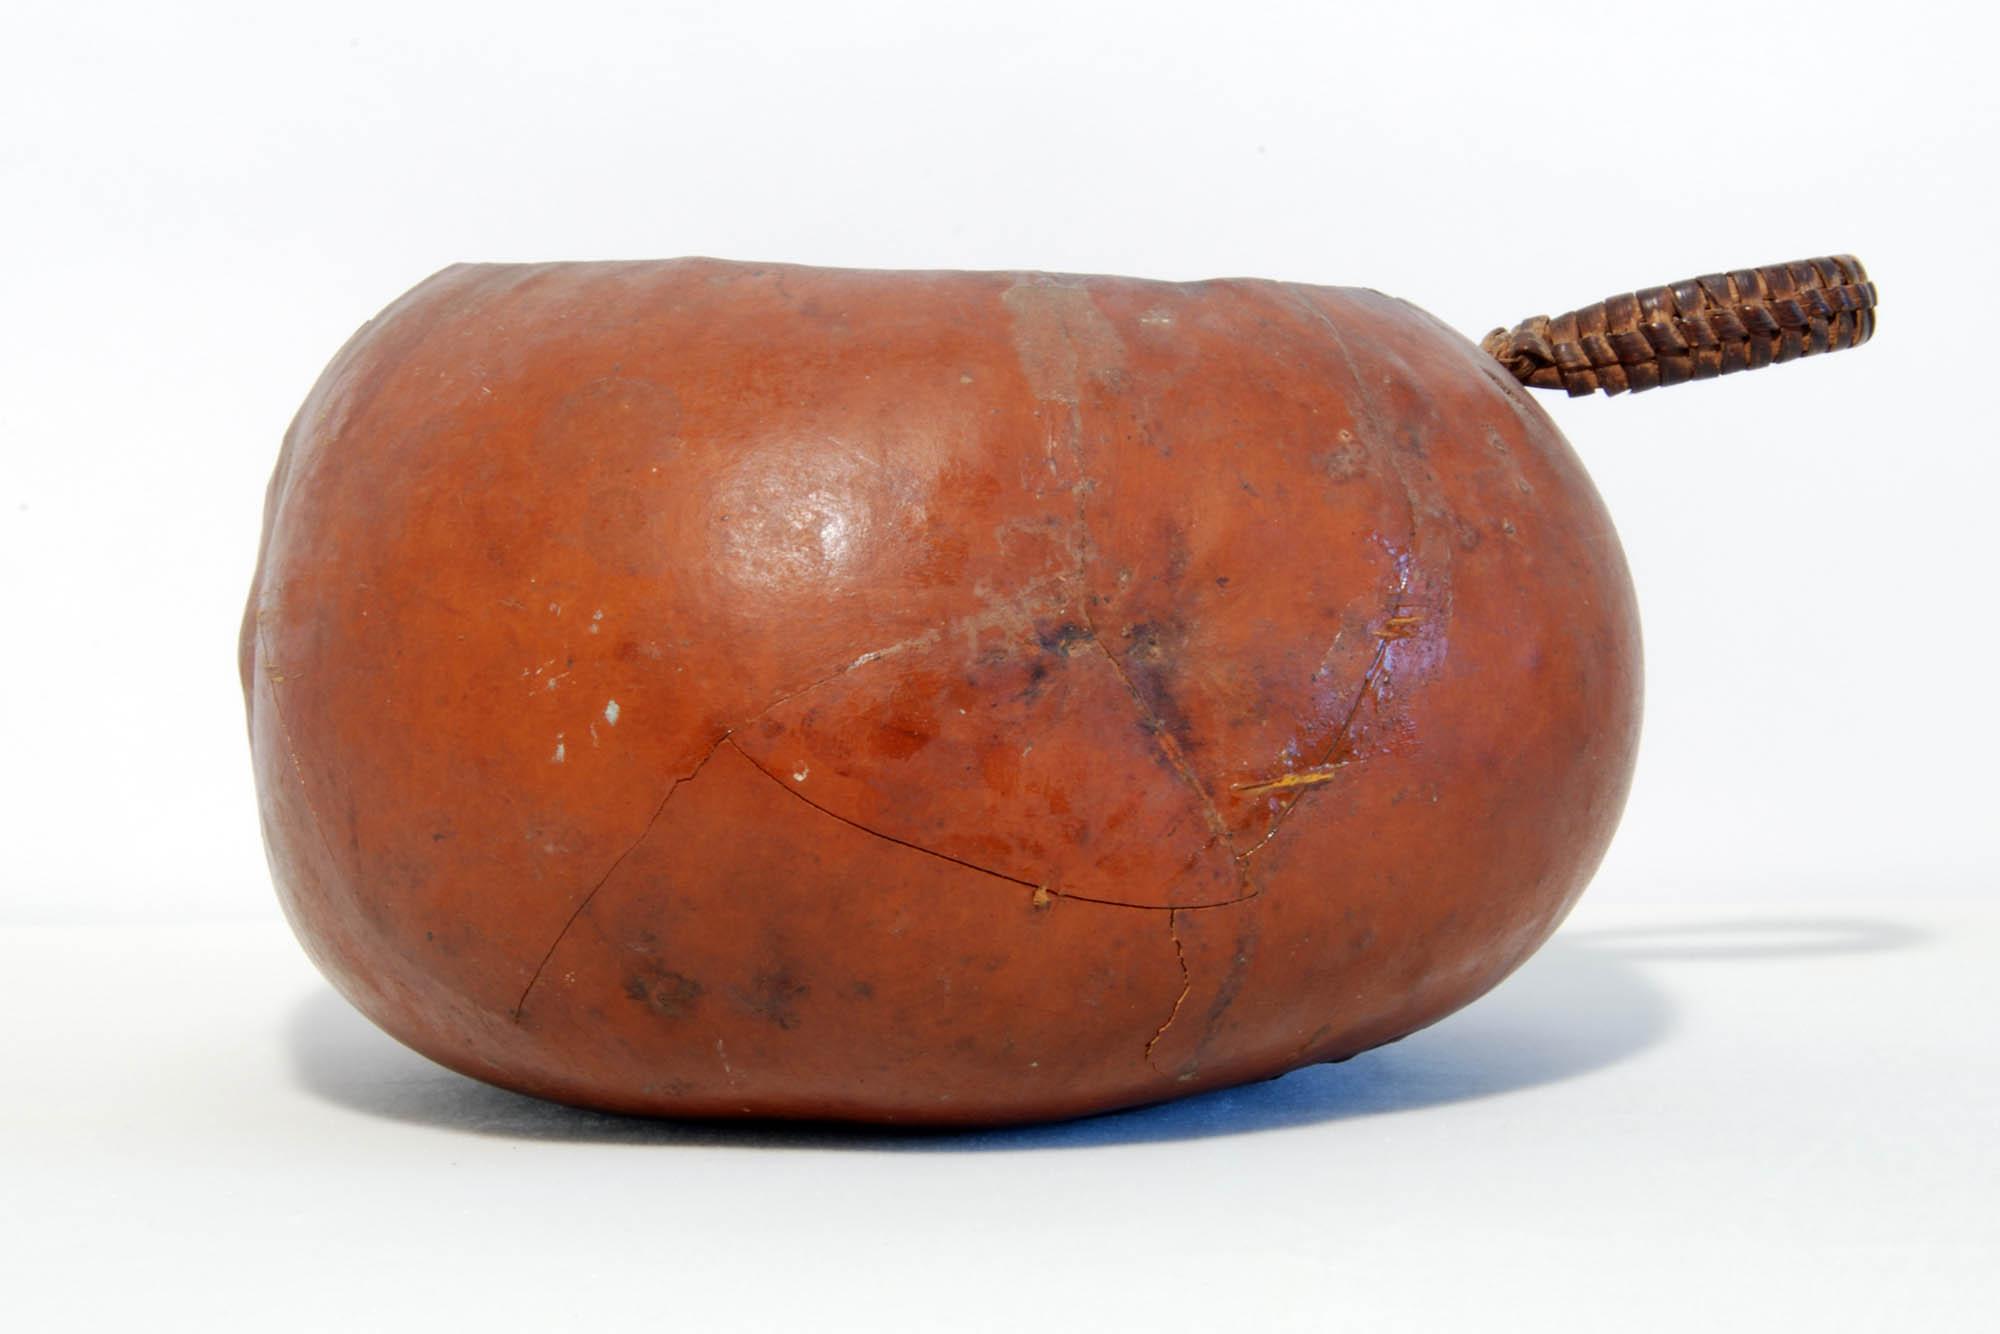 Palm wine gourd